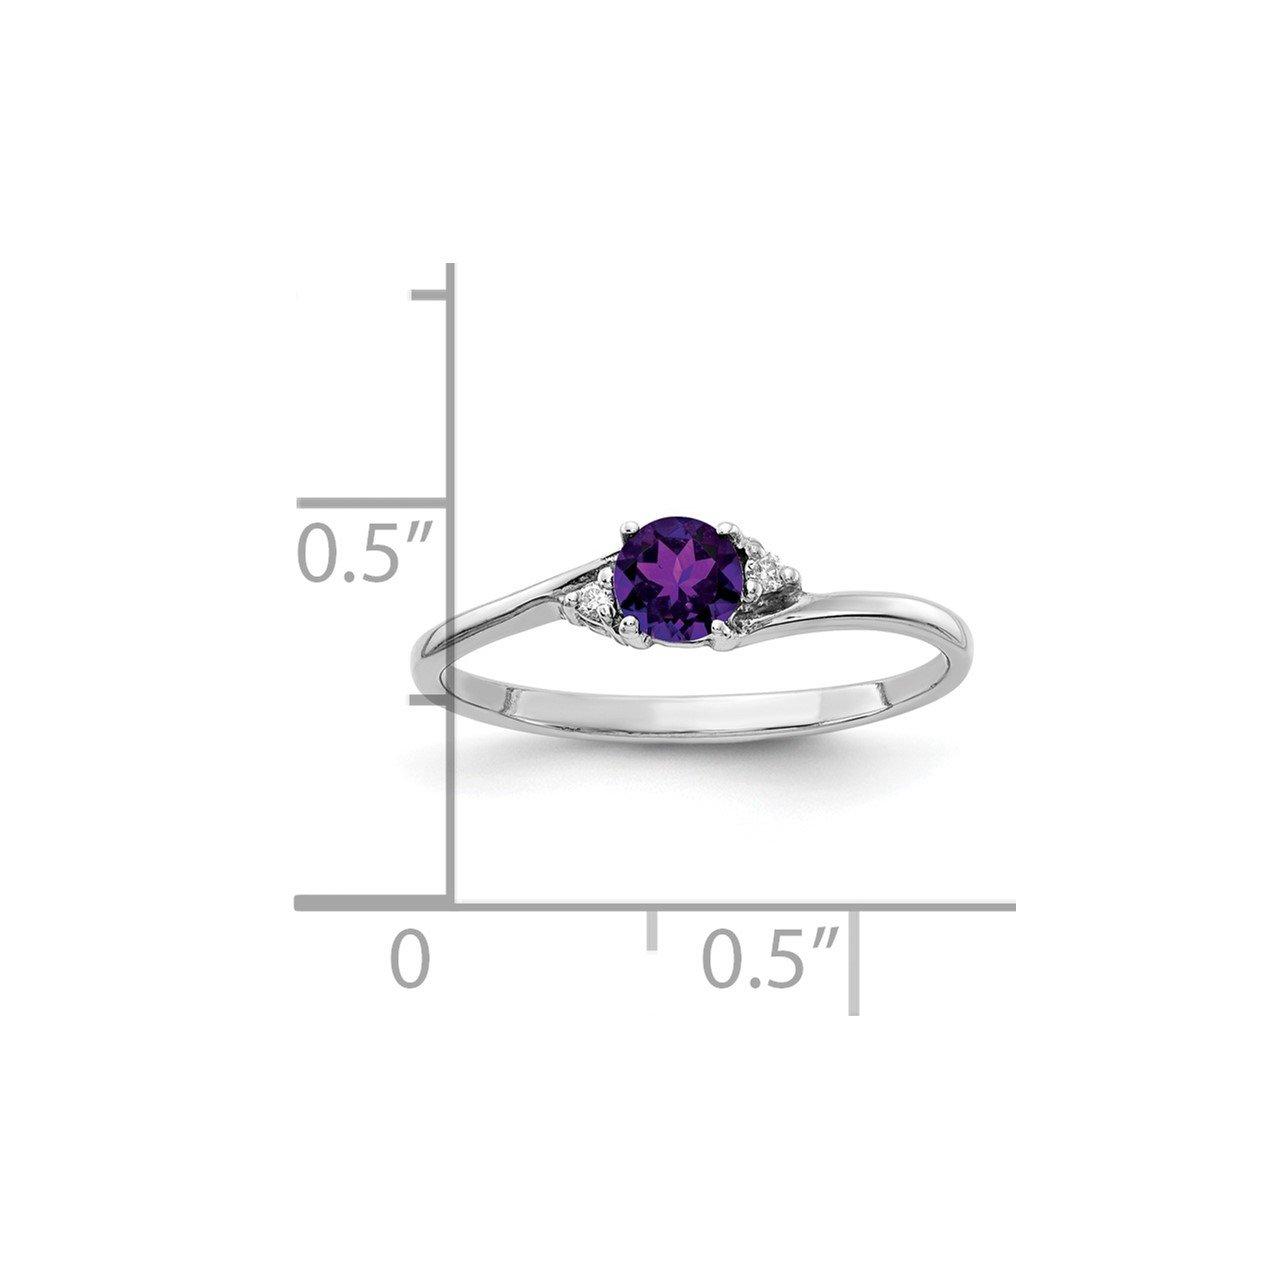 14k White Gold Diamond and Gemstone Ring Mtg-1